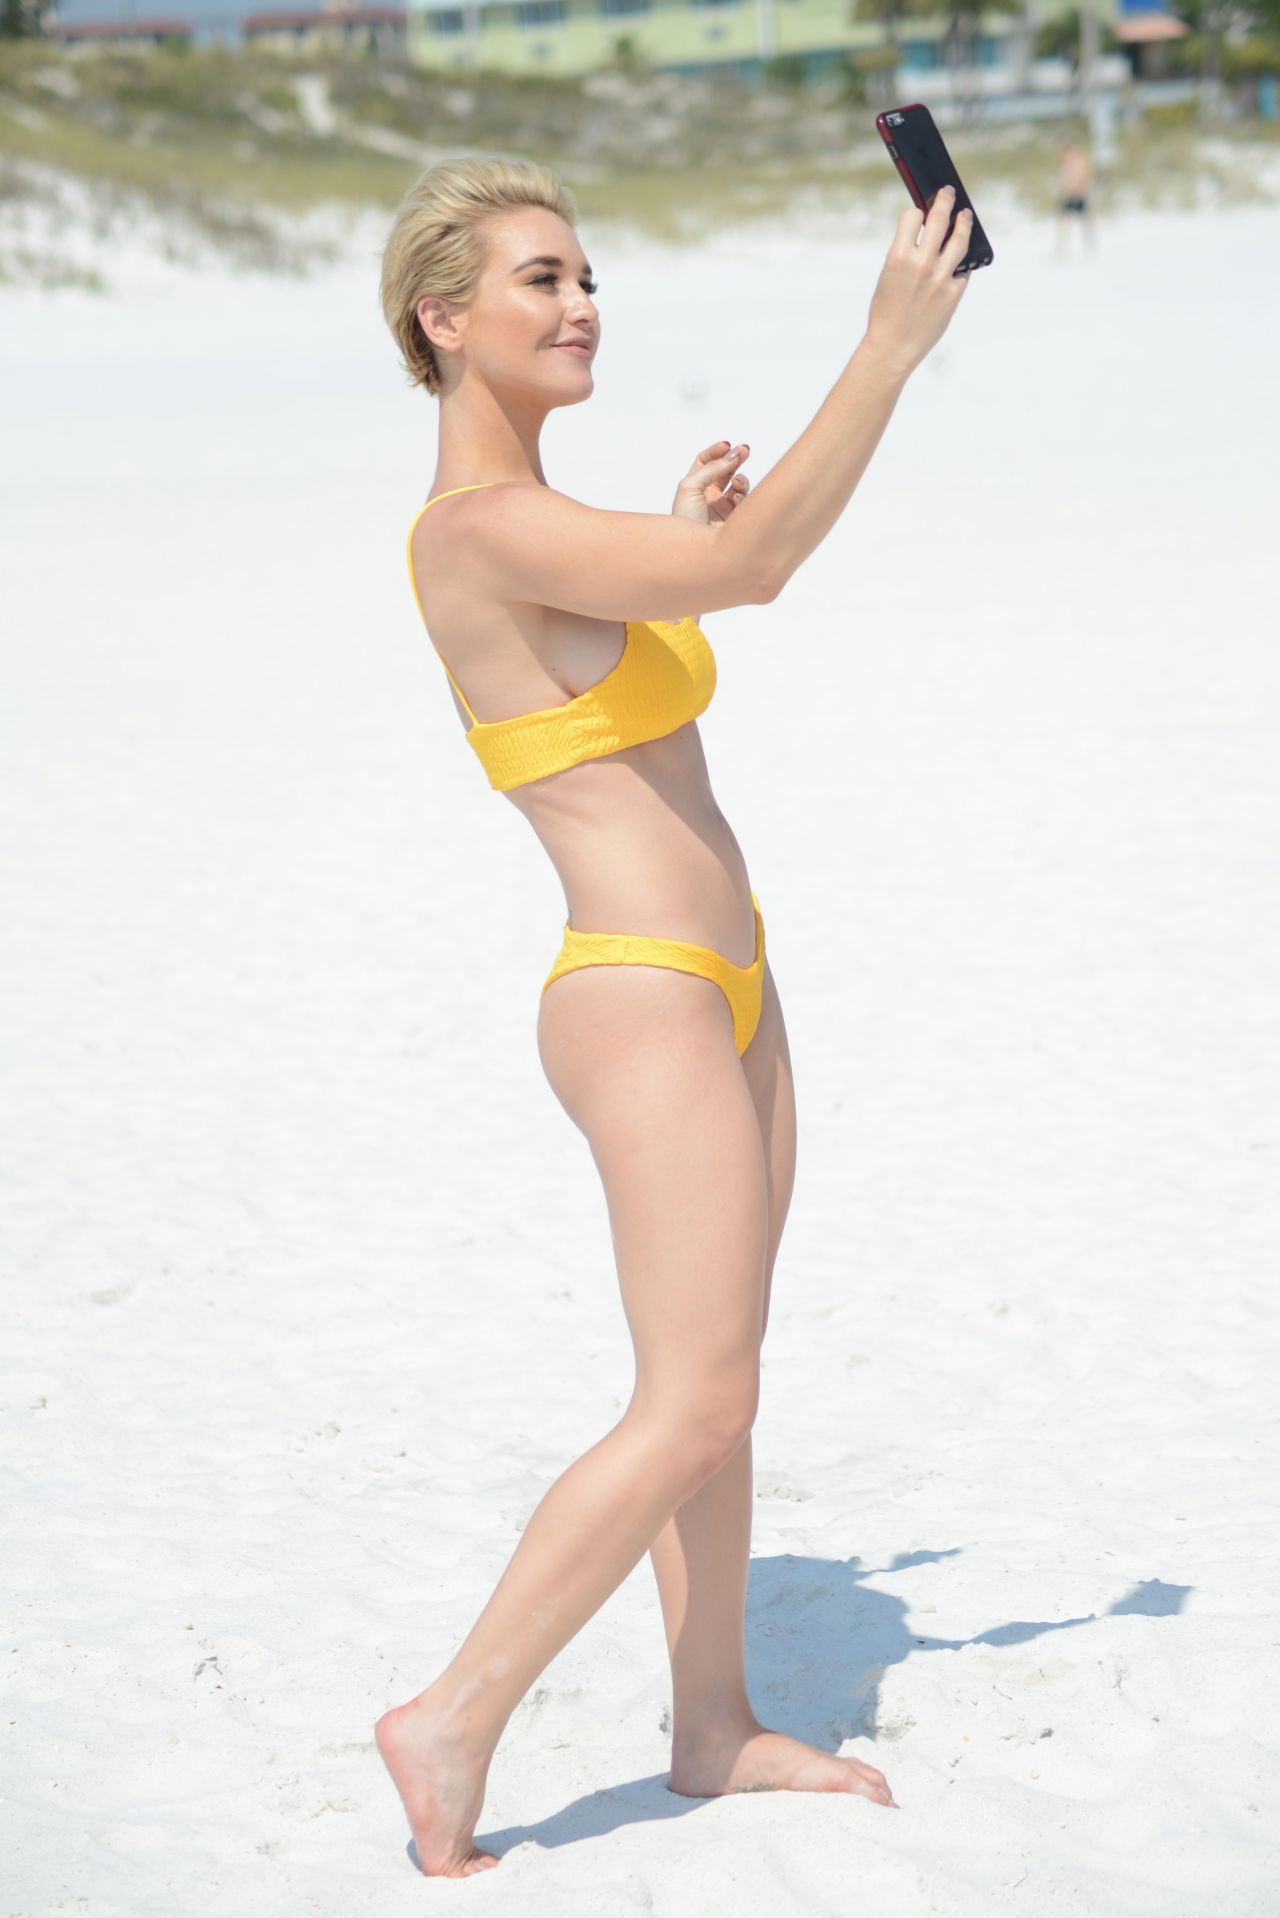 2019 Lauren Elizabeth Hubbard naked (39 photos), Tits, Hot, Boobs, butt 2006